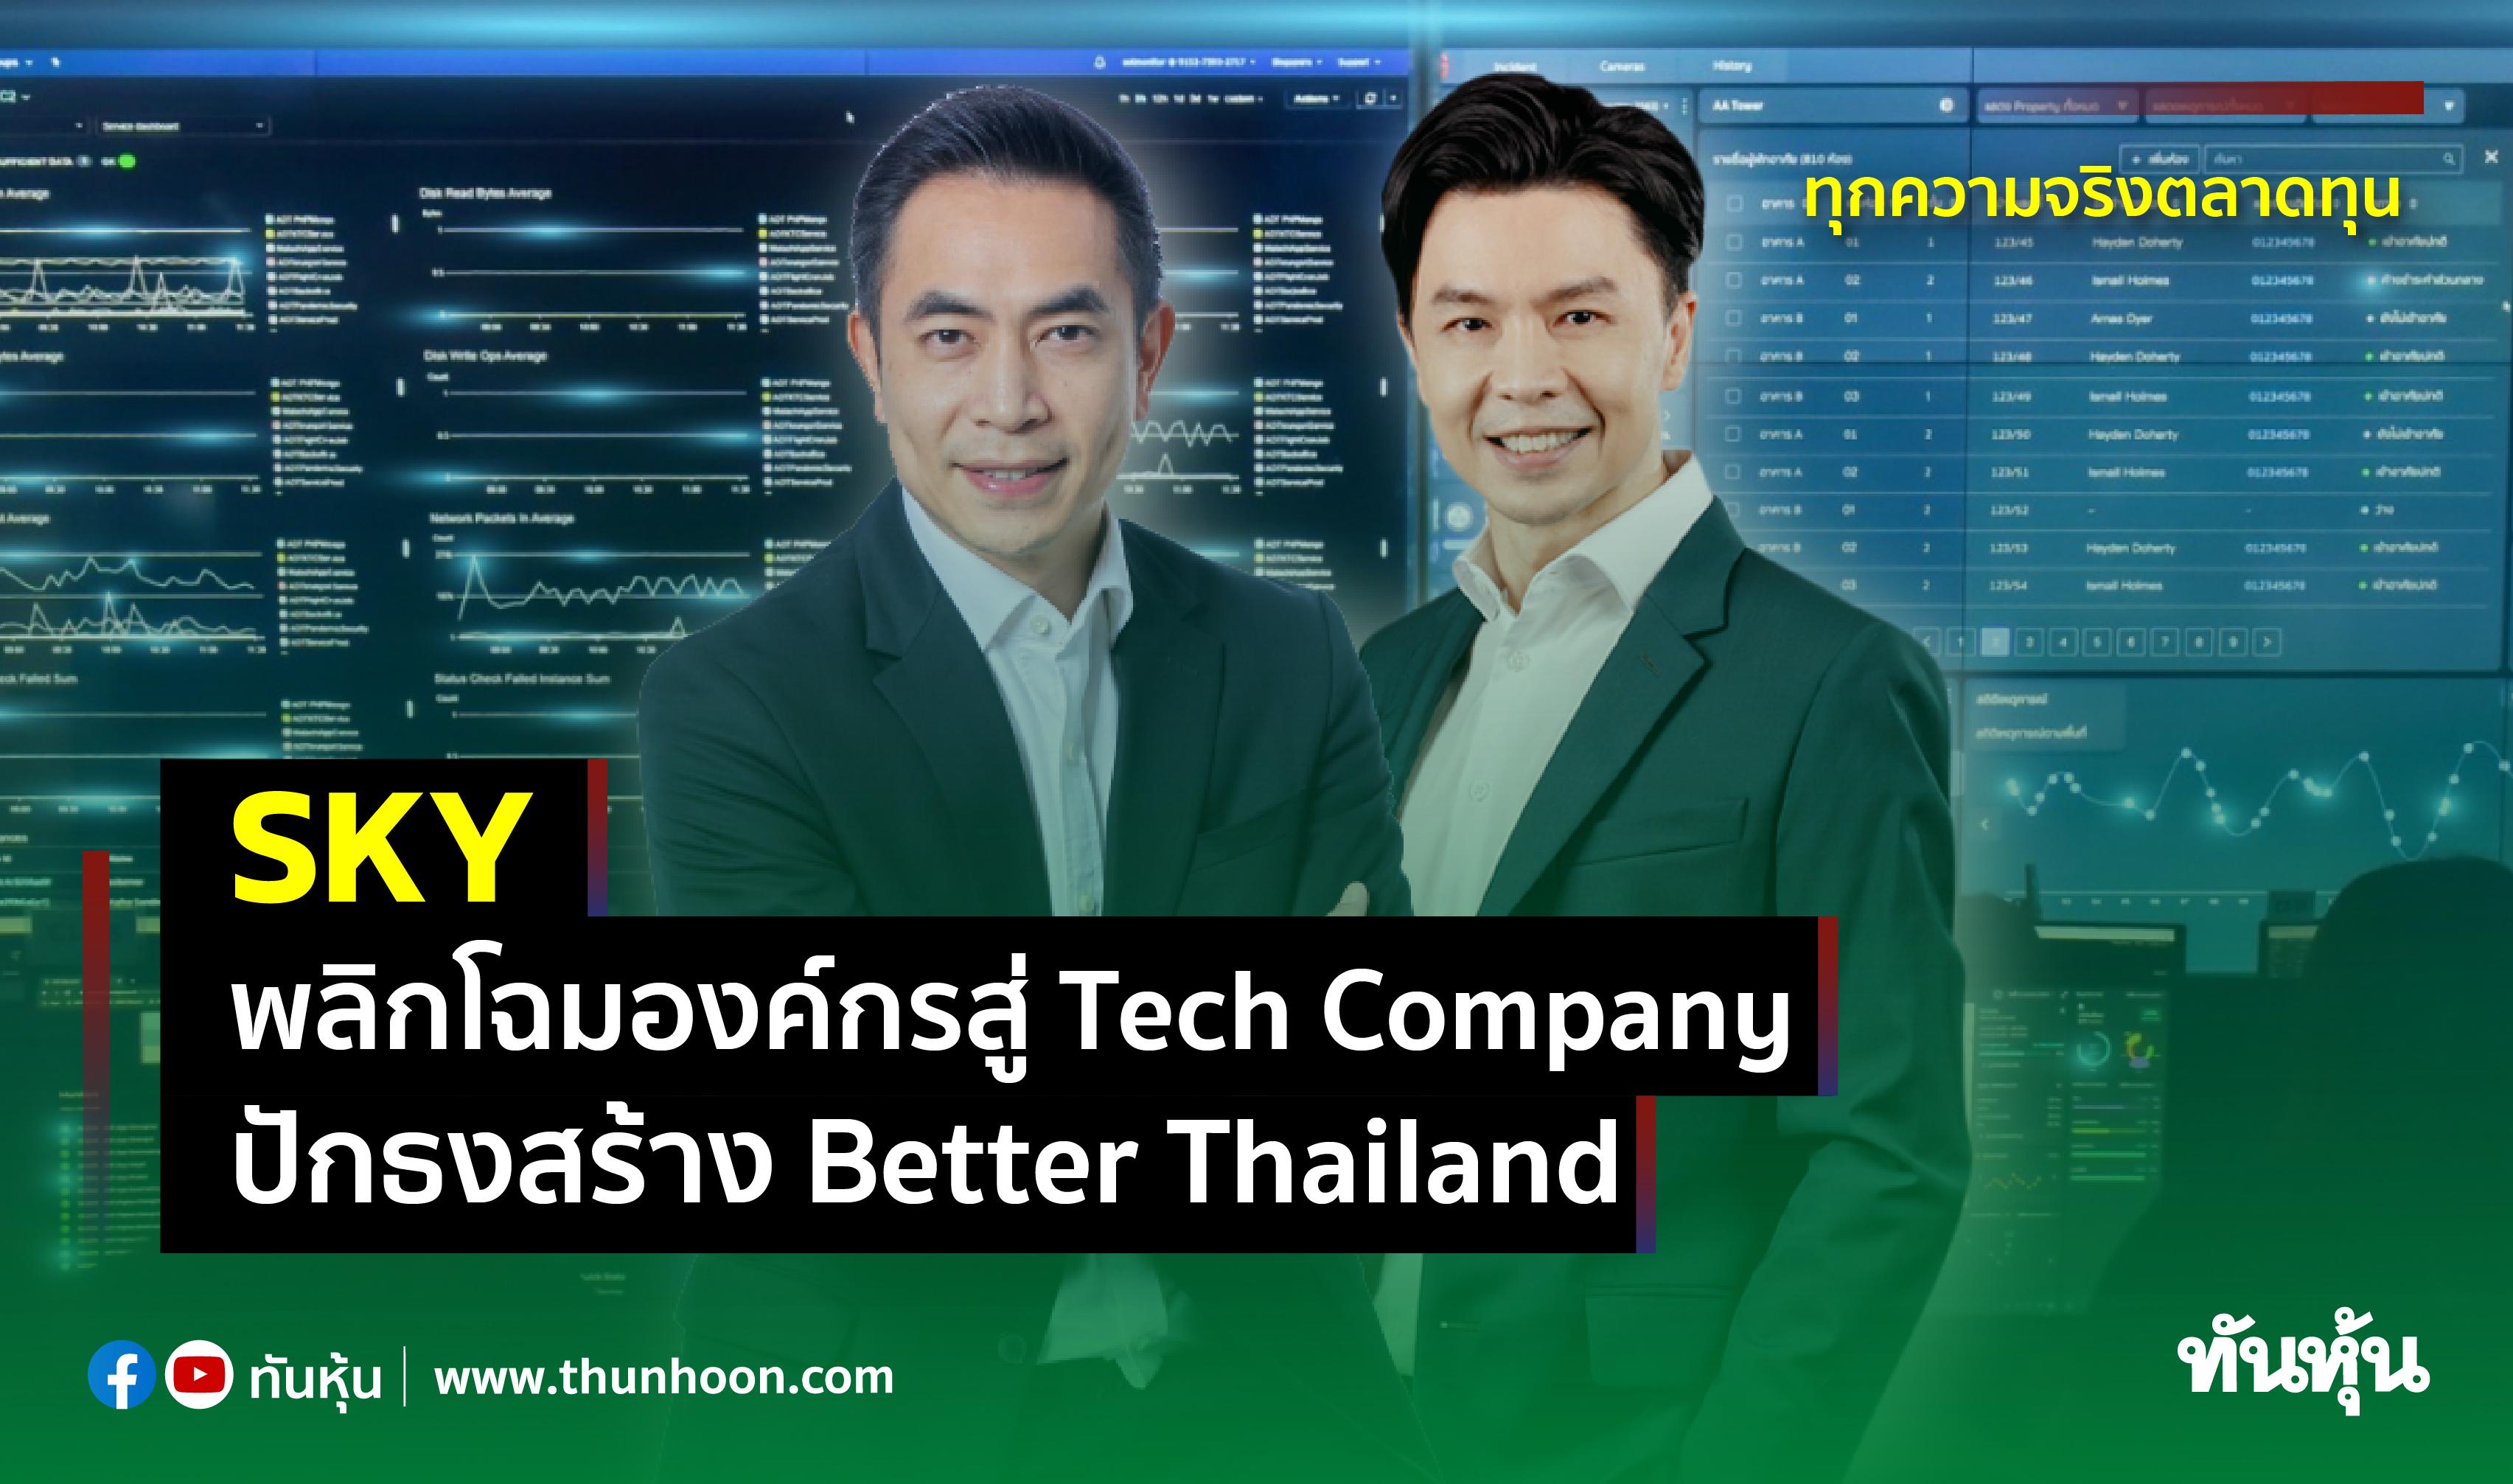 SKY พลิกโฉมองค์กรสู่ Tech Company ปักธงสร้าง Better Thailand